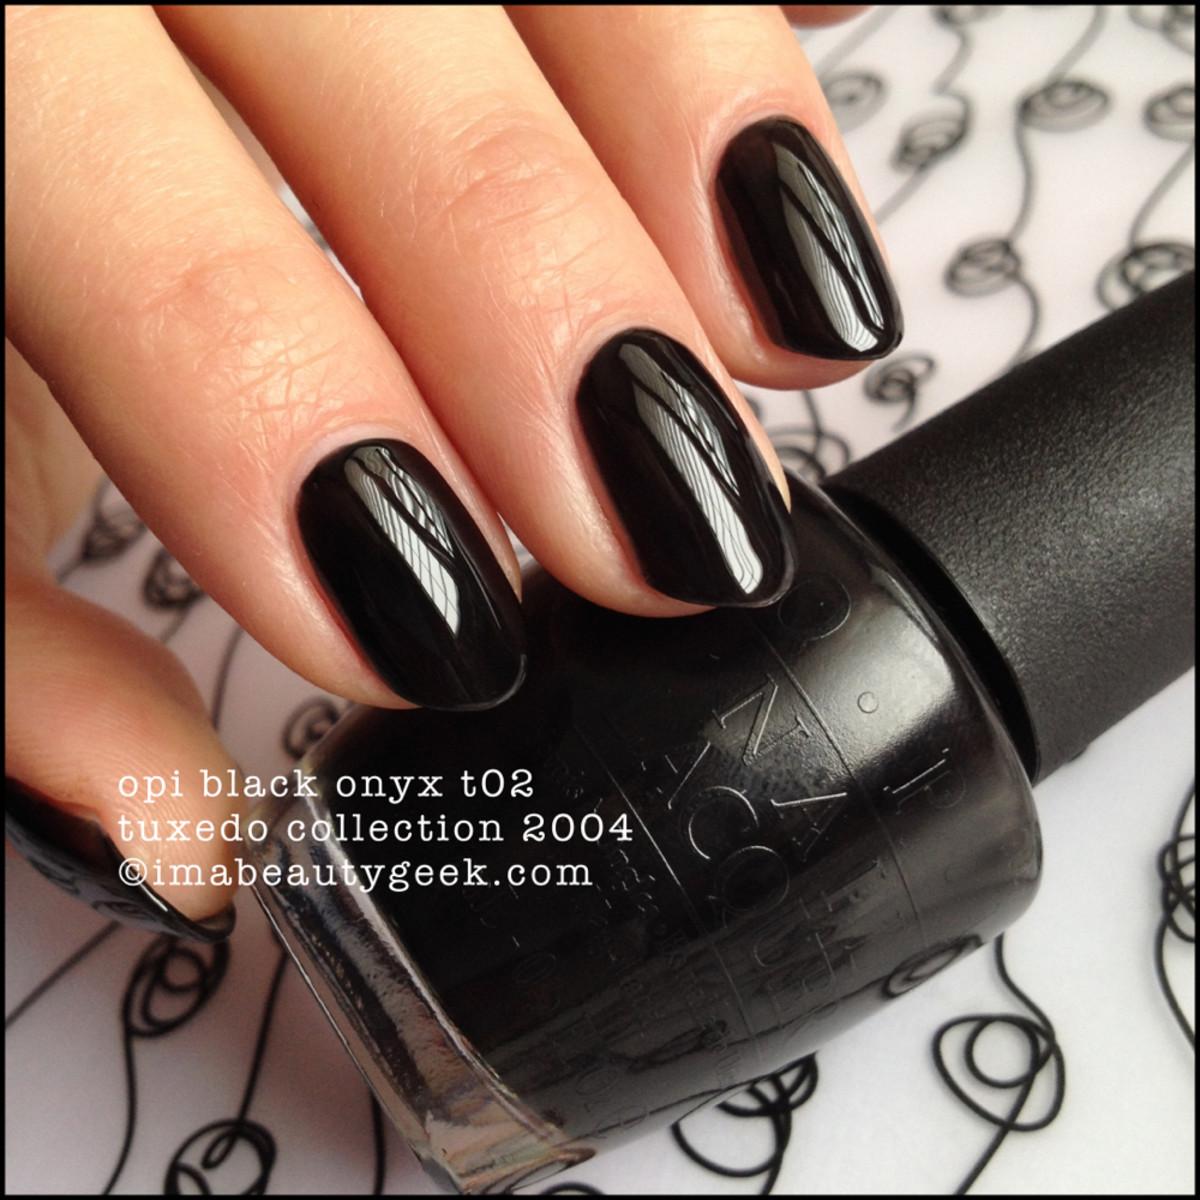 OPI Black Onyx NL T02 Tuxedo Collection 2004